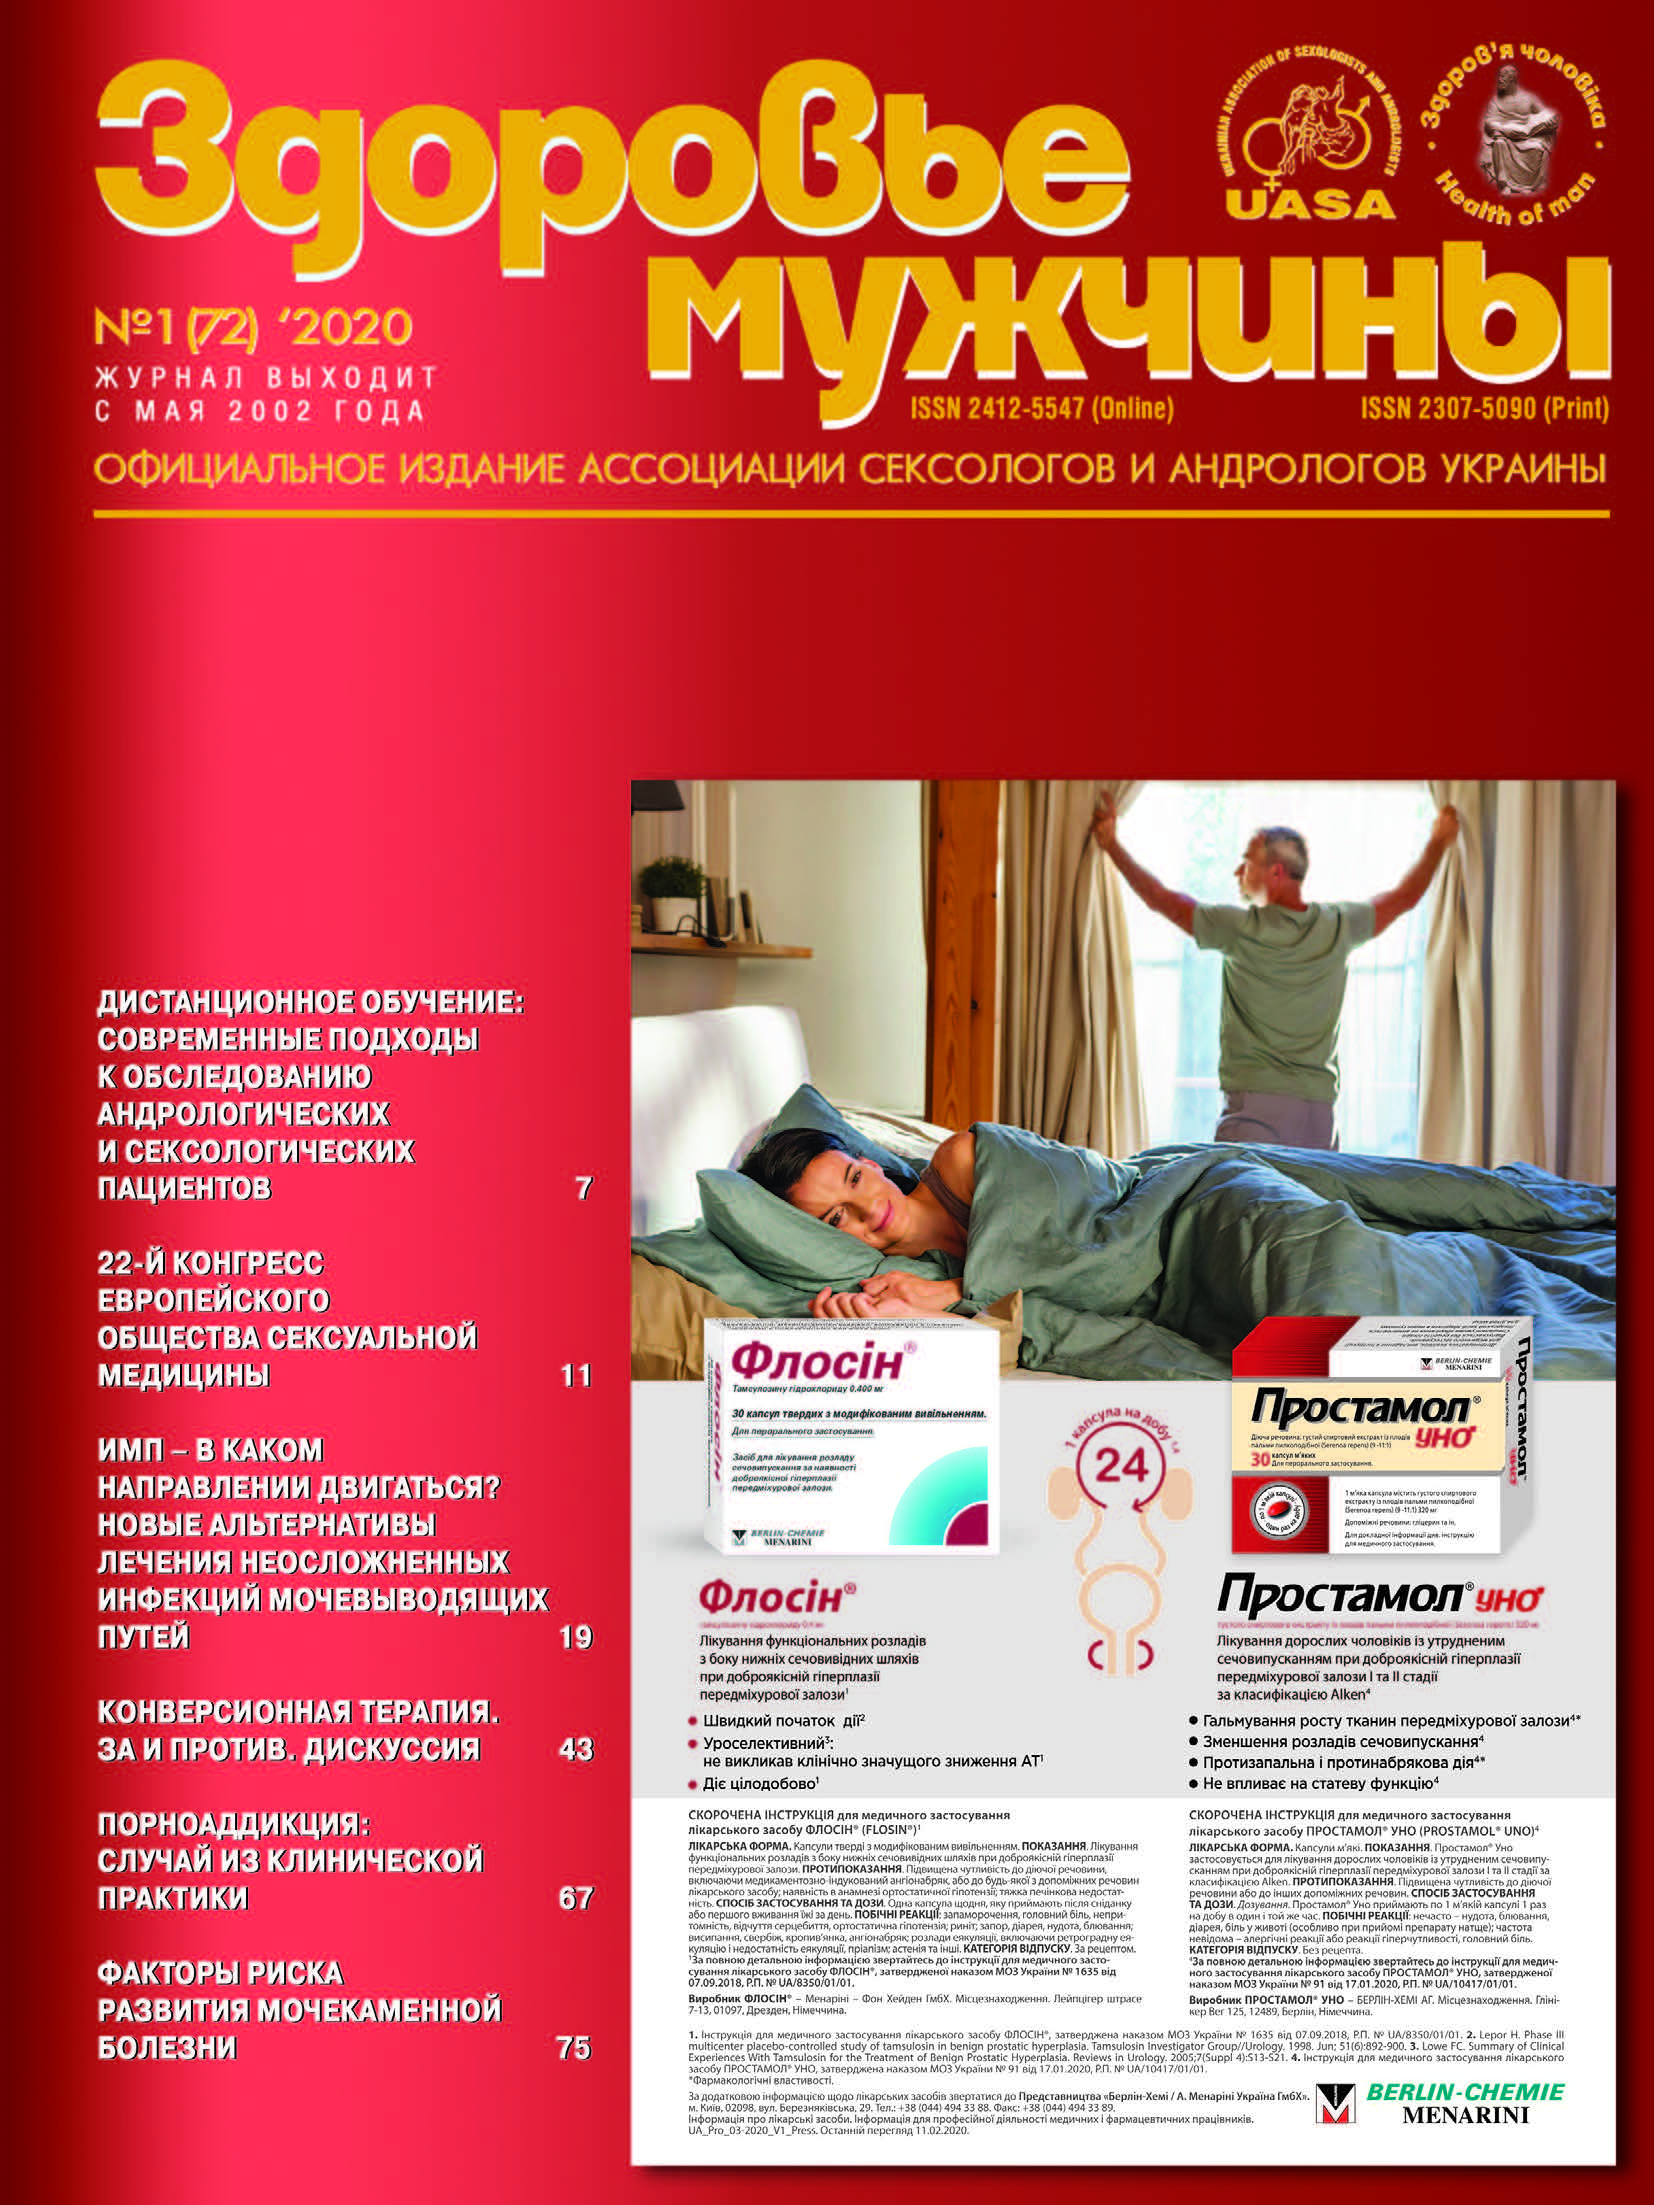 chronic nonbacterial prostatitis symptoms